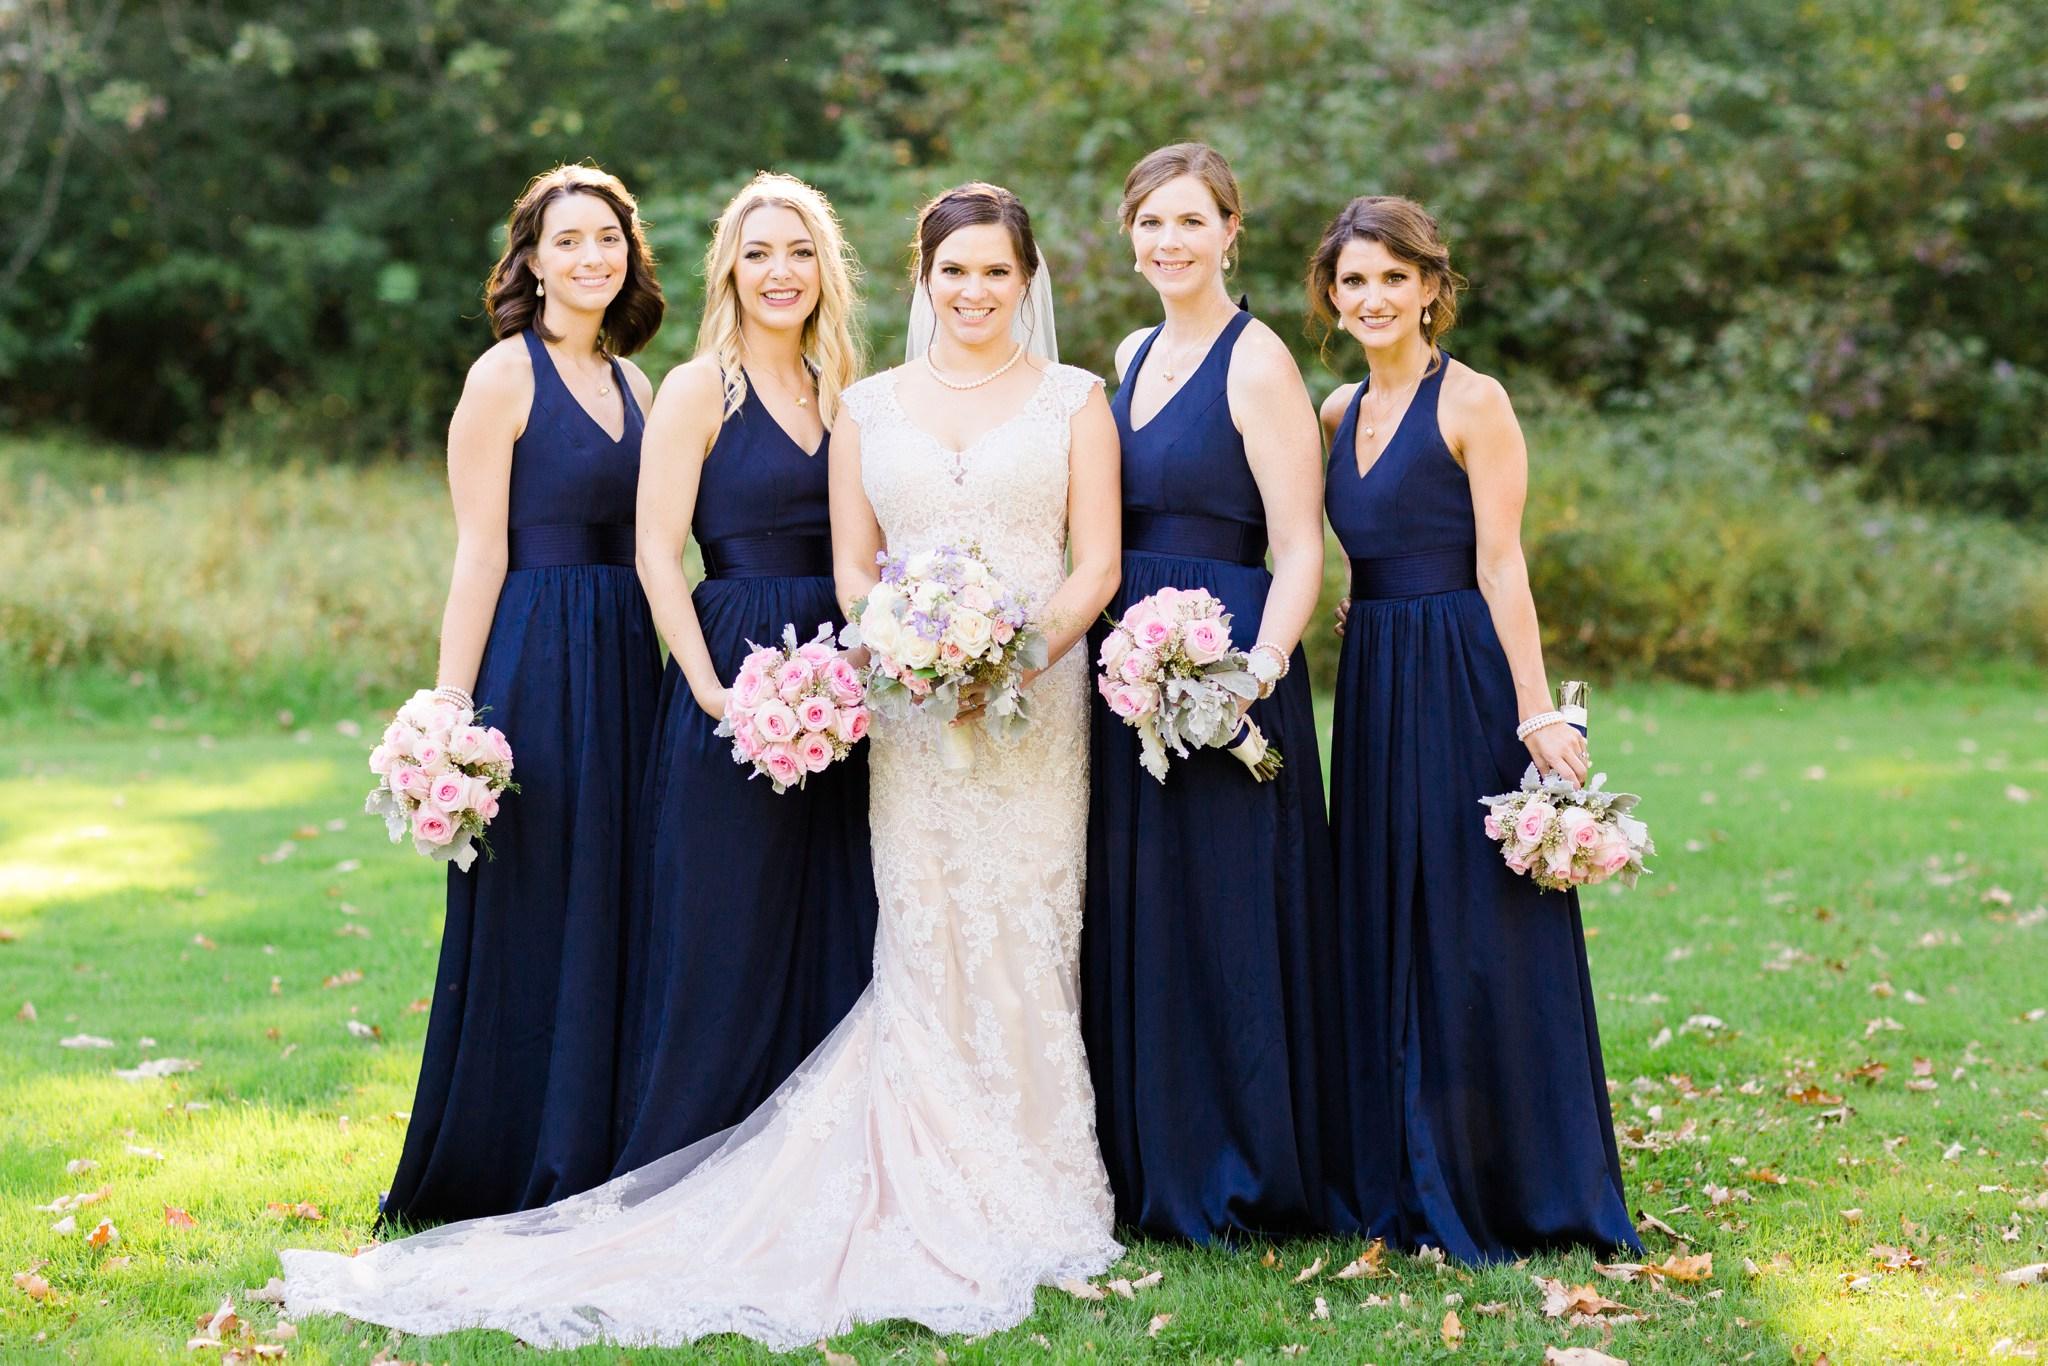 Fall_new_england_wedding_photos_00021.JPG